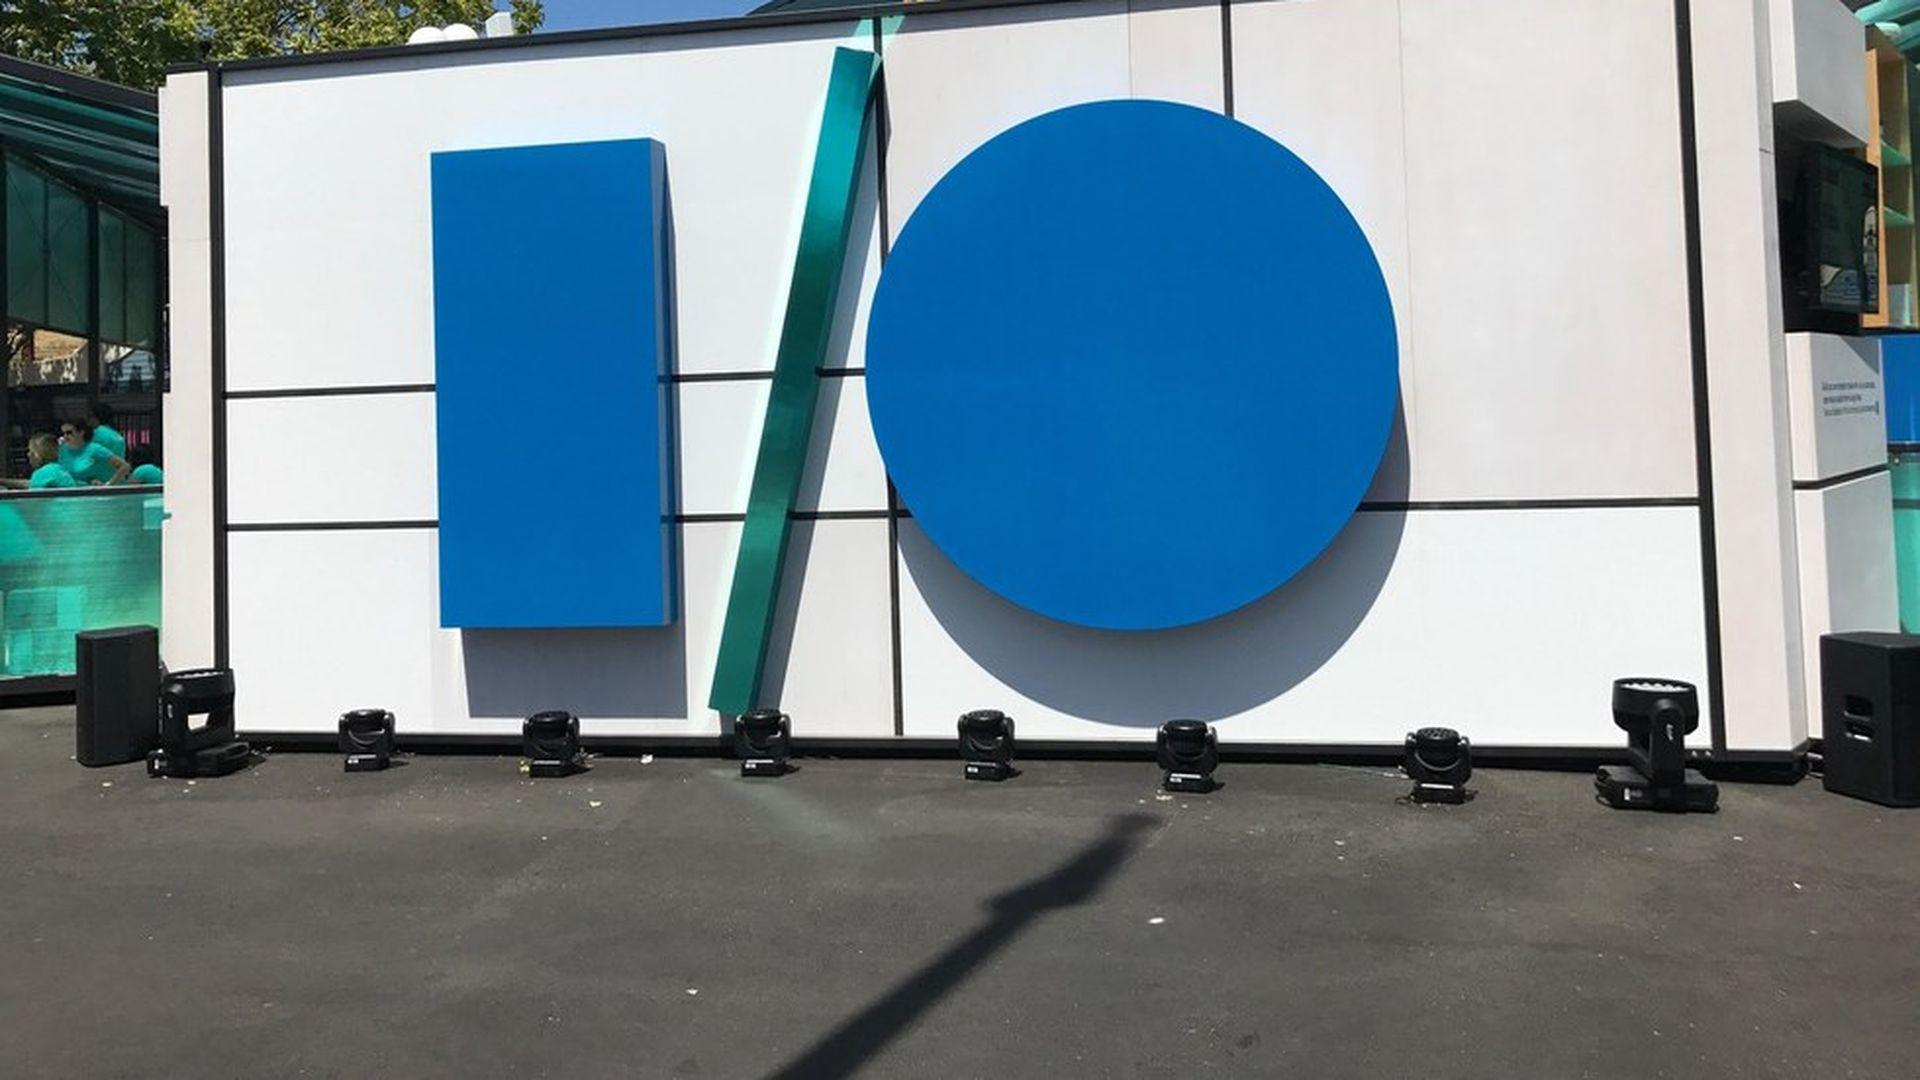 3 key takeaways from Google's I/O developer conference